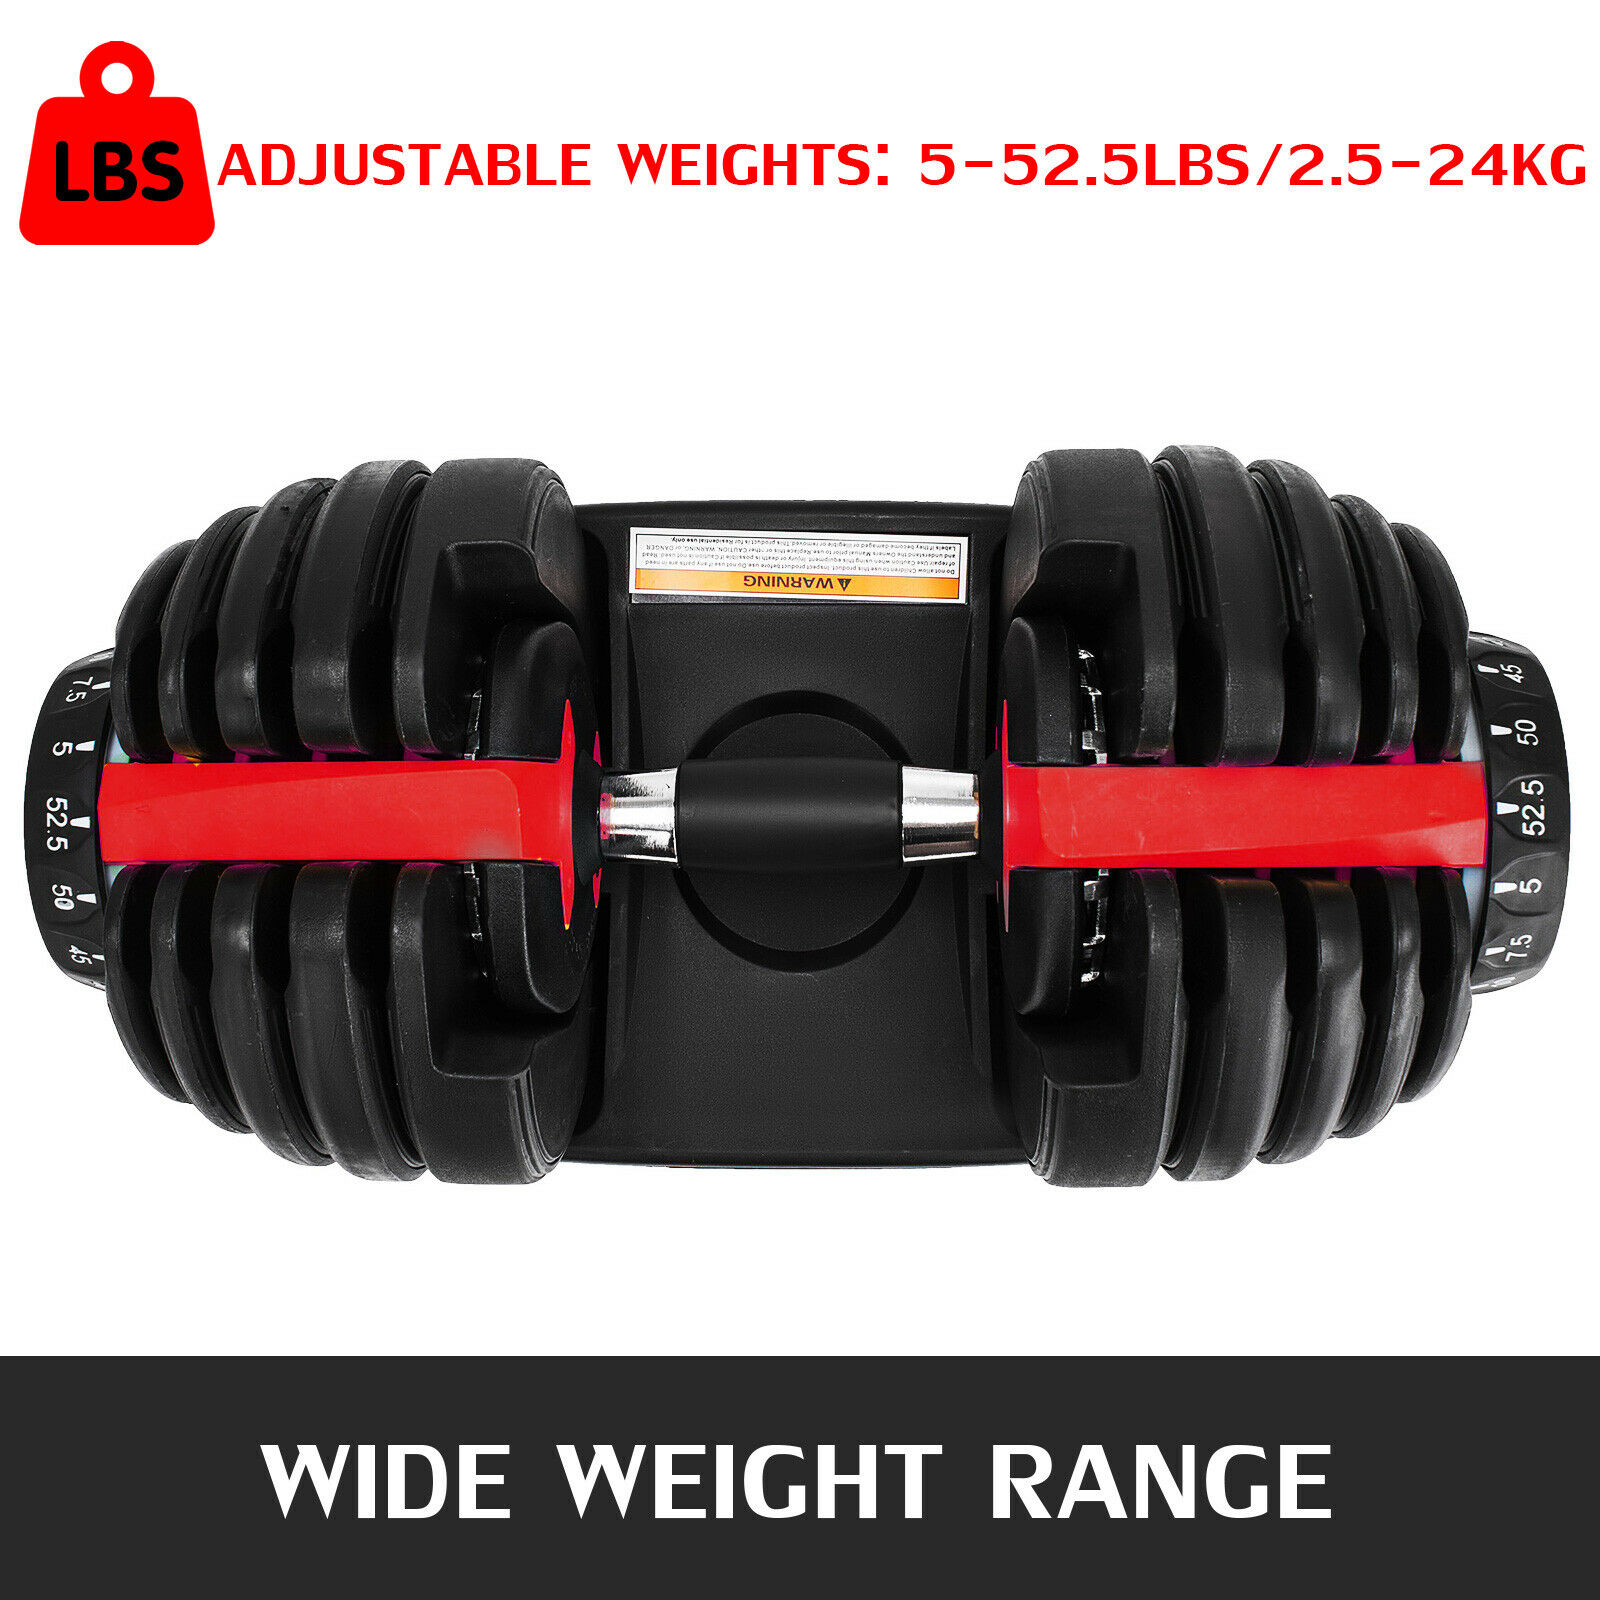 FEB 2021 PRE ORDER 24kg Adjustable Dumbbells Home Workout GYM Exercise Weights